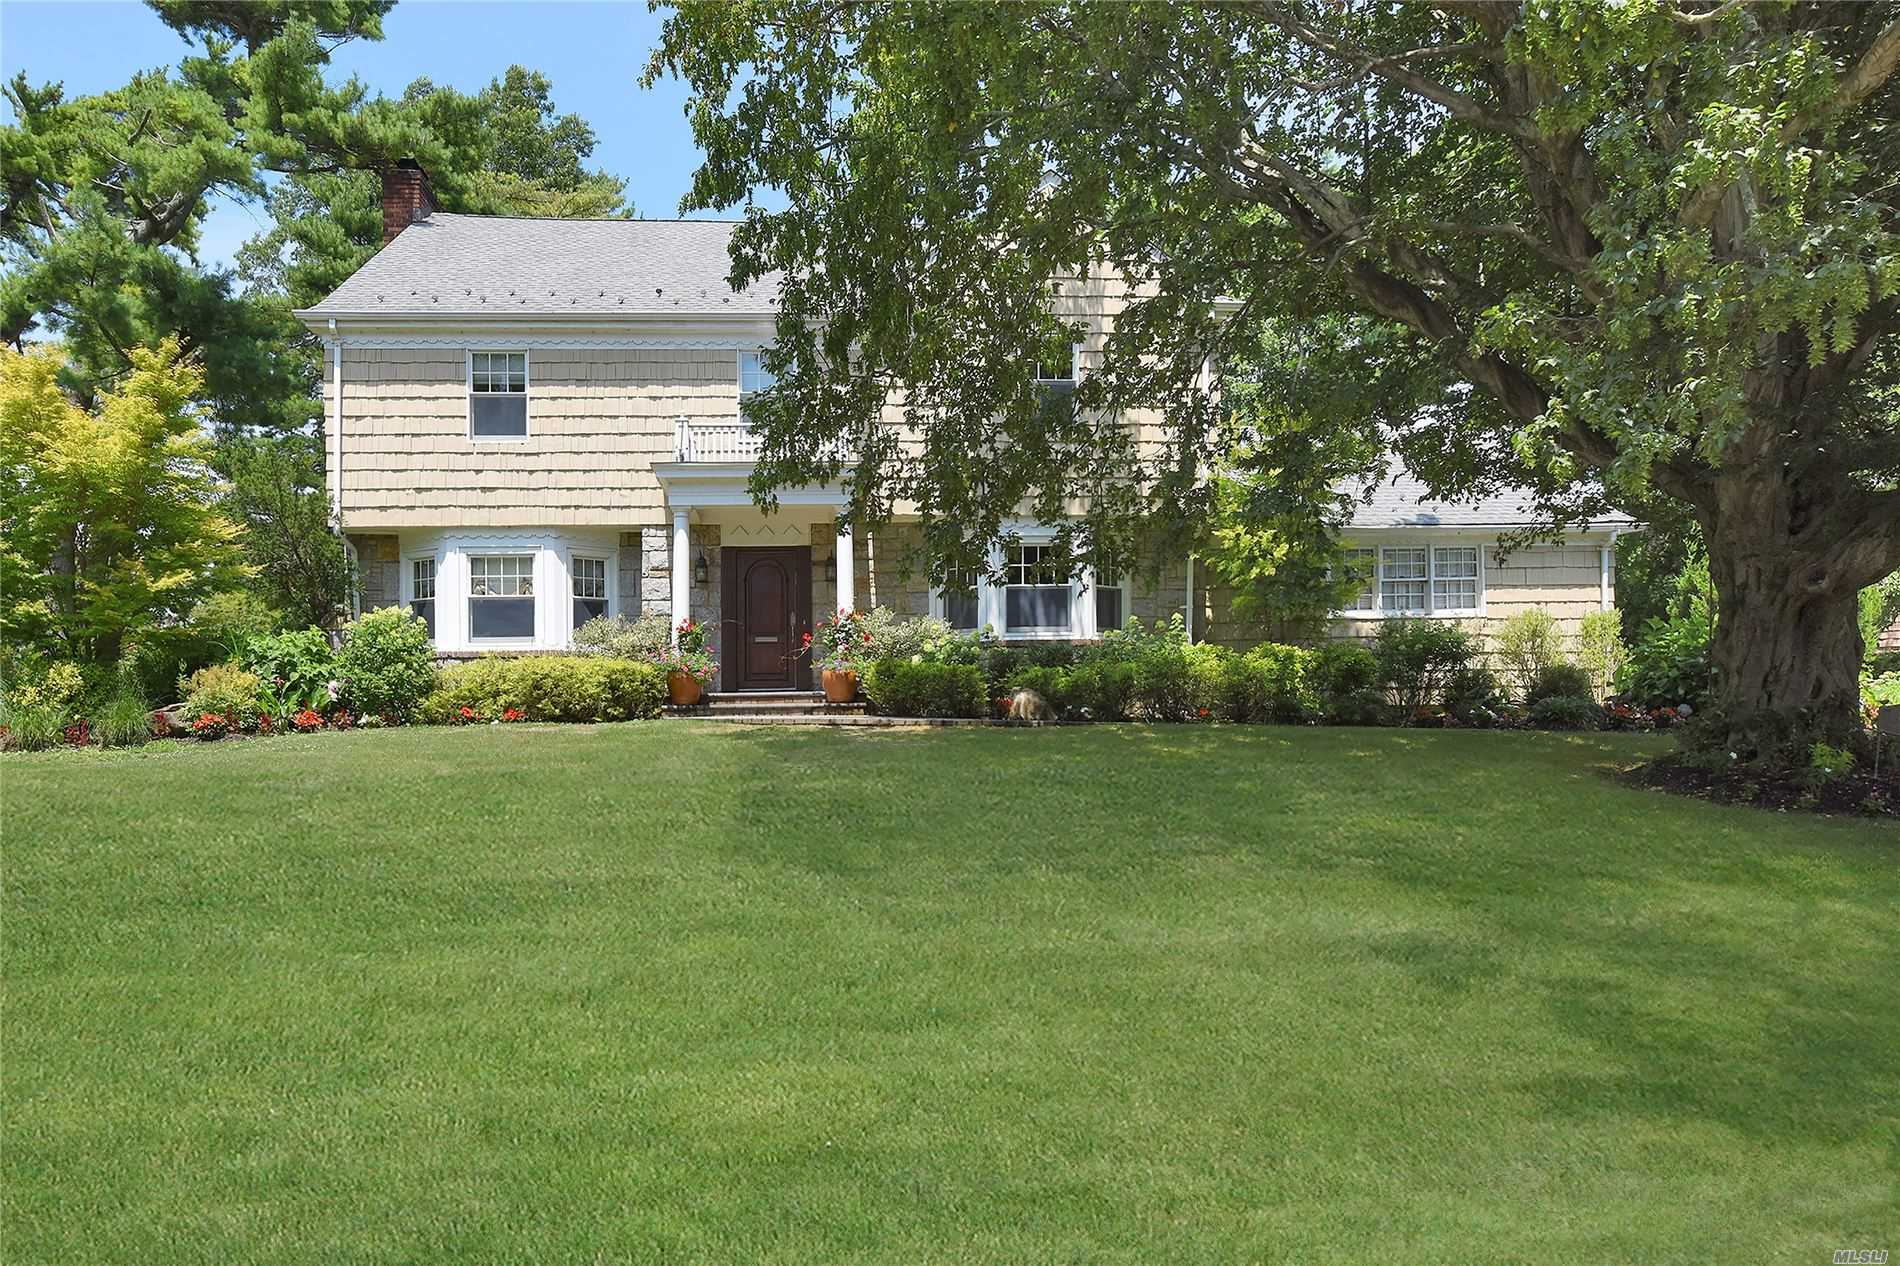 878 Ivy Hill Rd - Woodsburgh, New York